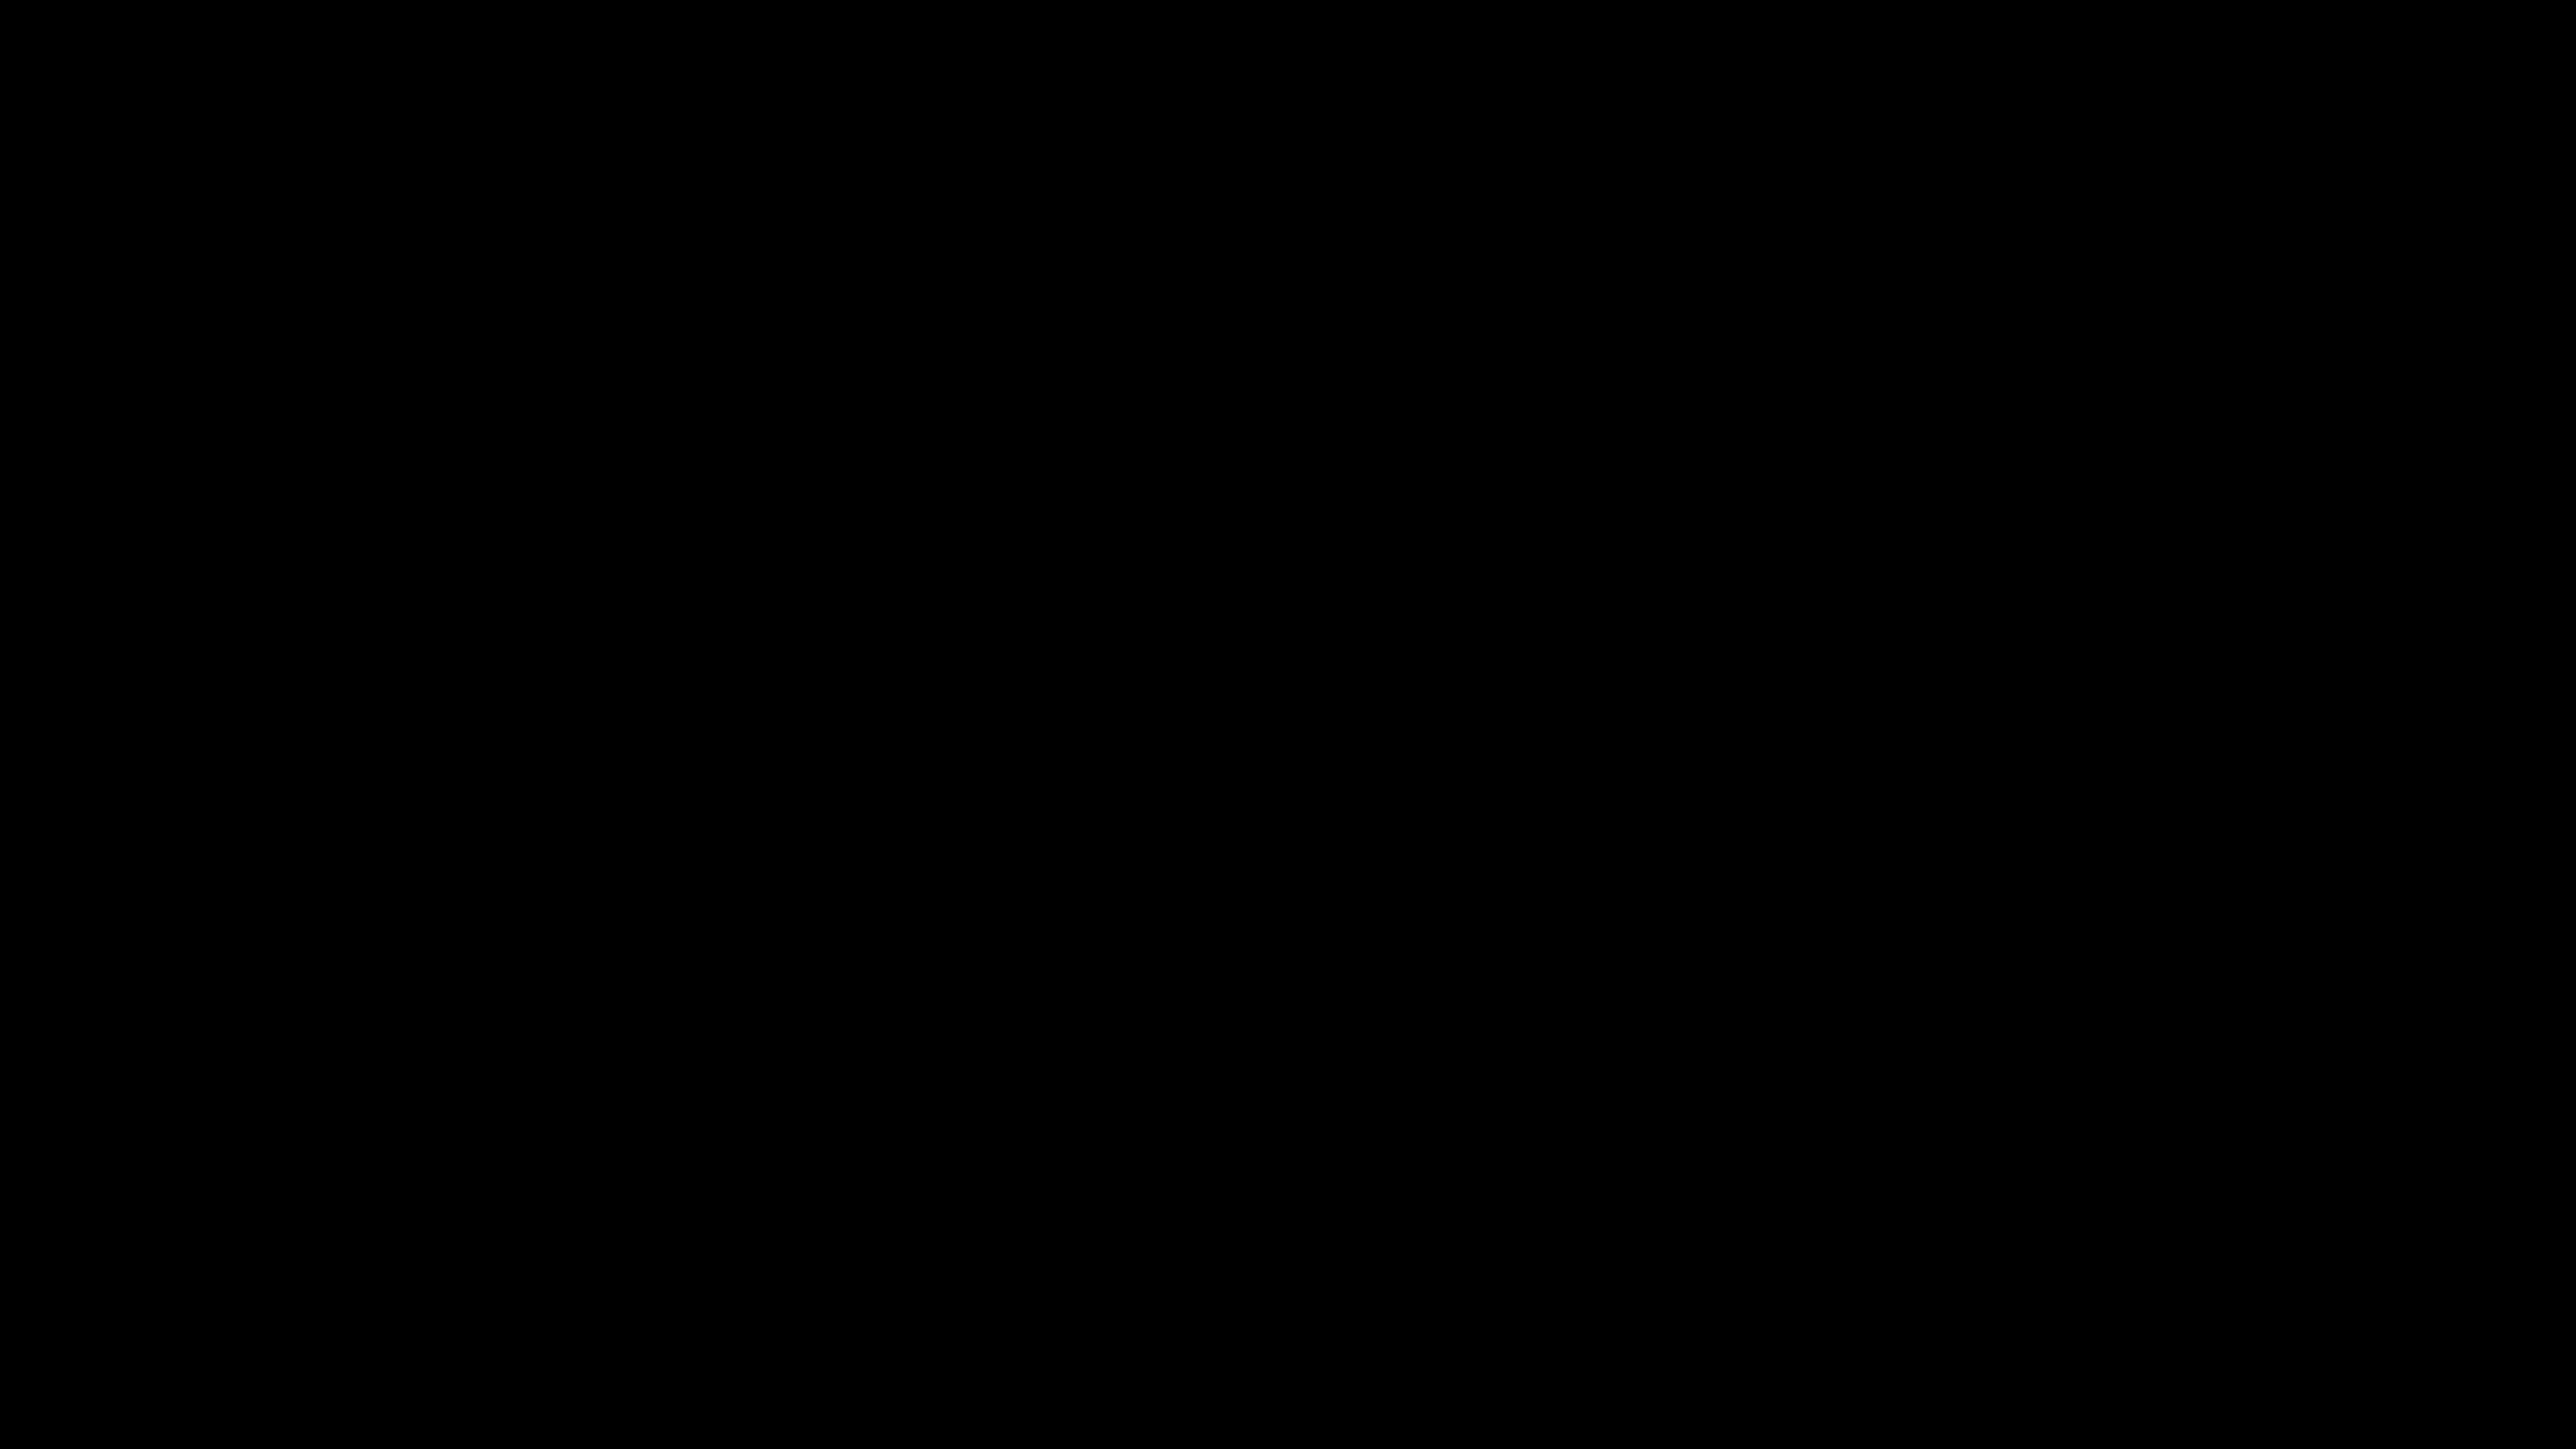 Chisel Galucho 9 Braços